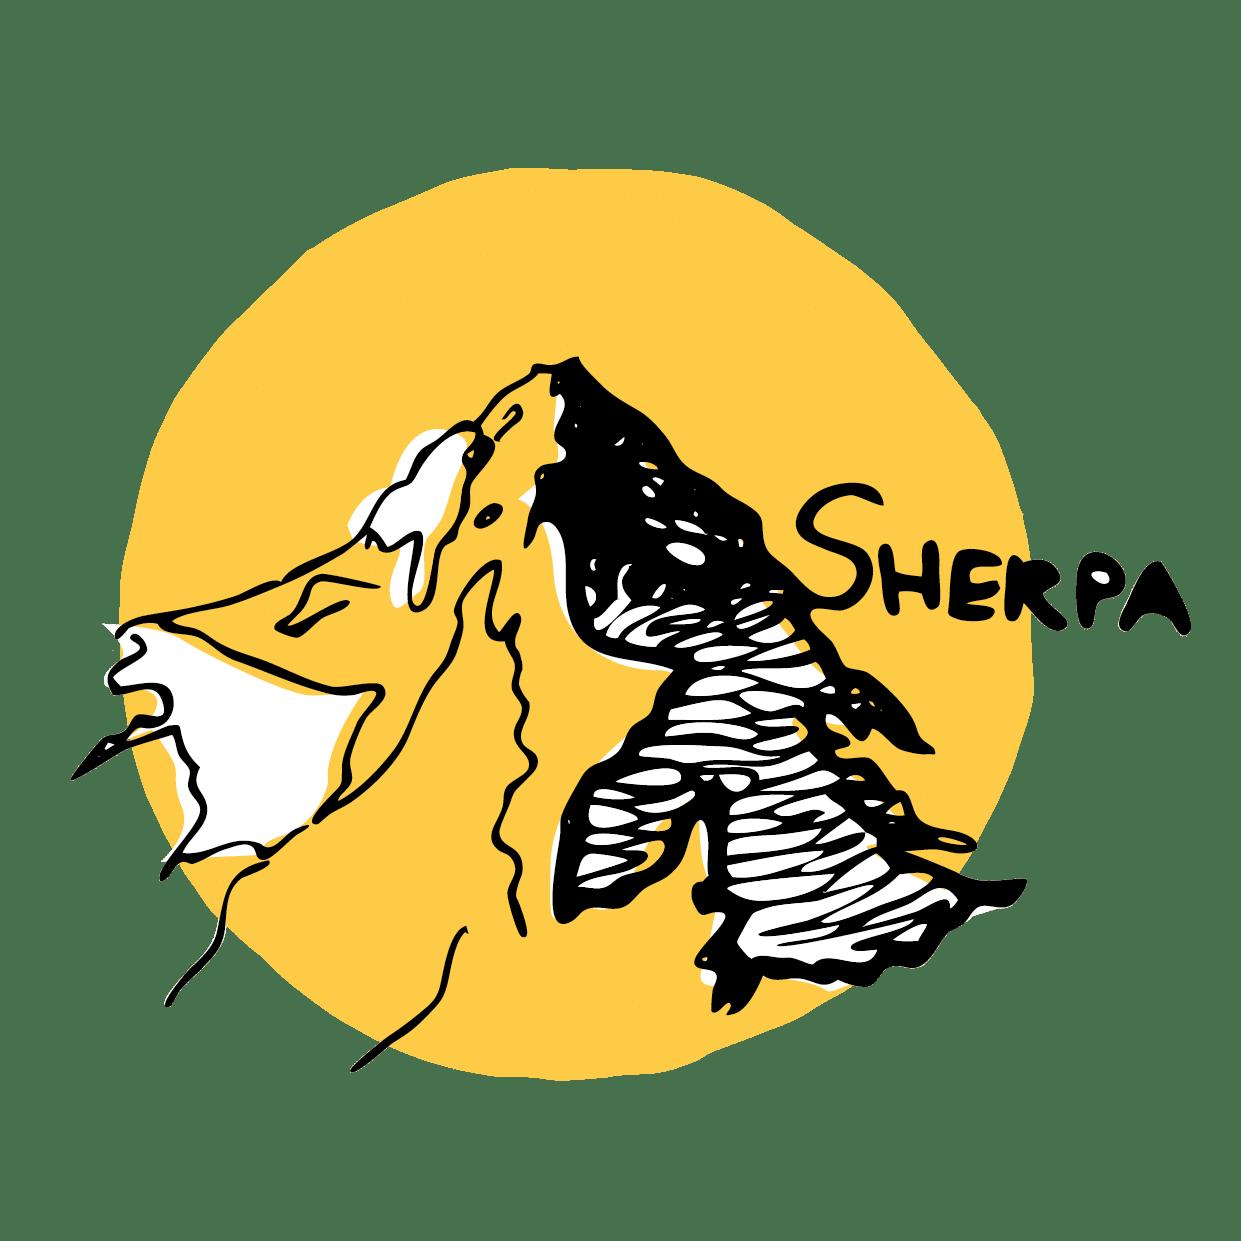 sherpa-valeur